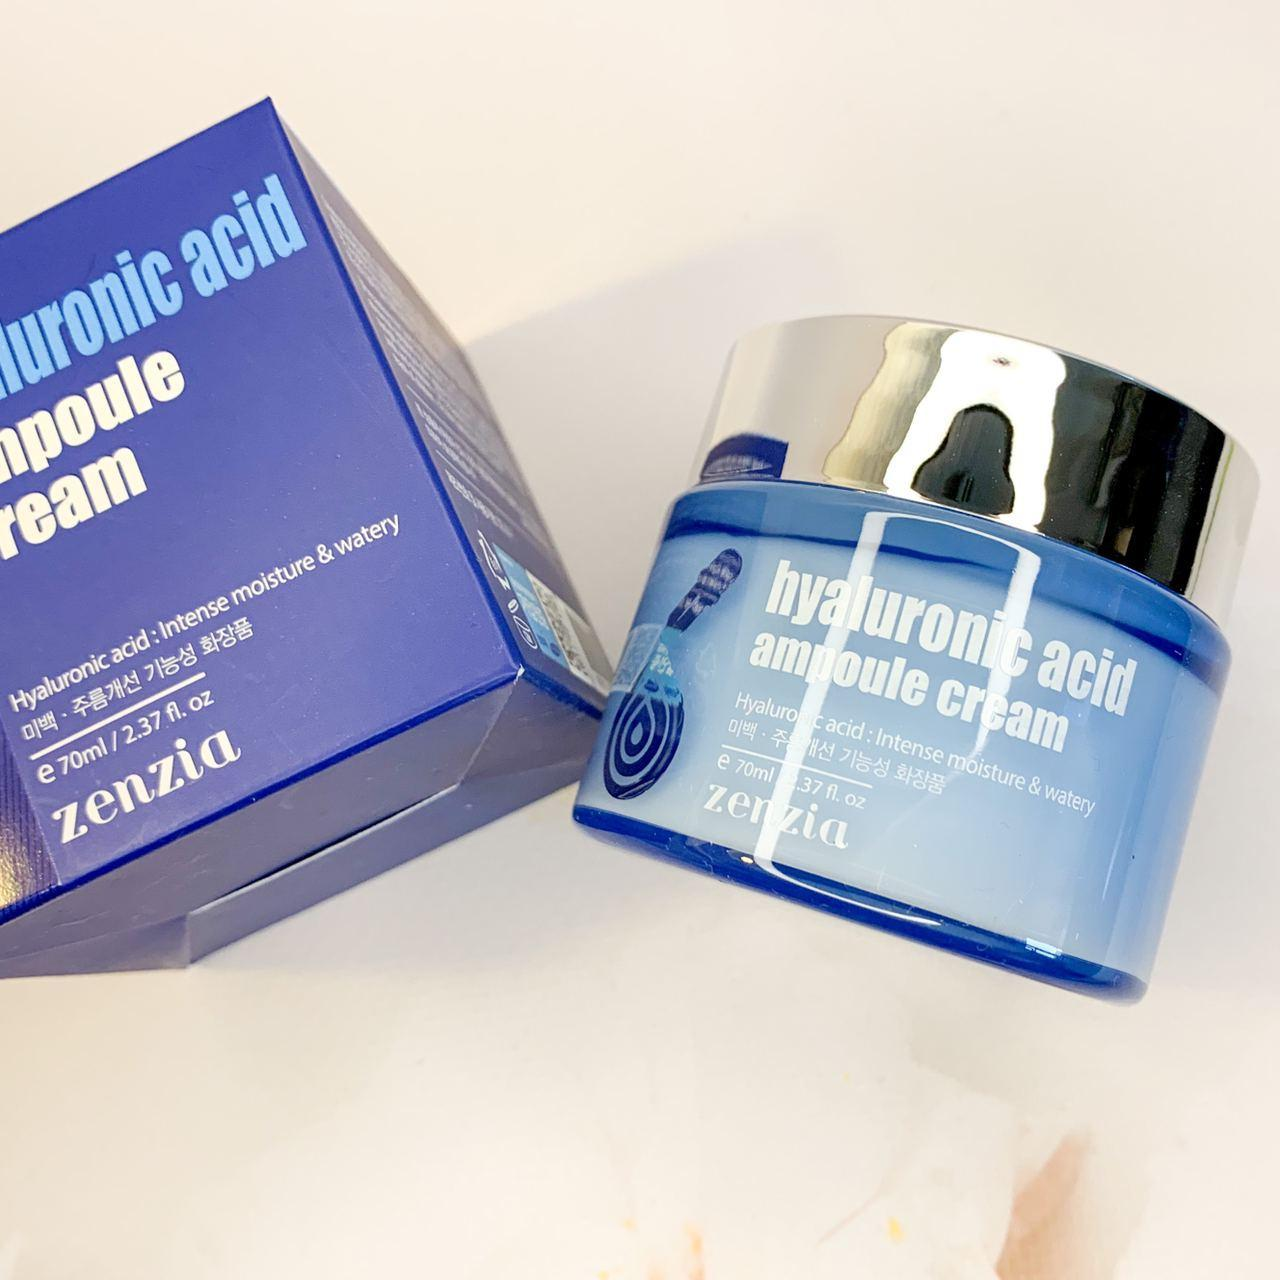 Крем с гиалуроновой кислотой Zenzia, Hyaluronic Acid Ampoule Cream 70мл